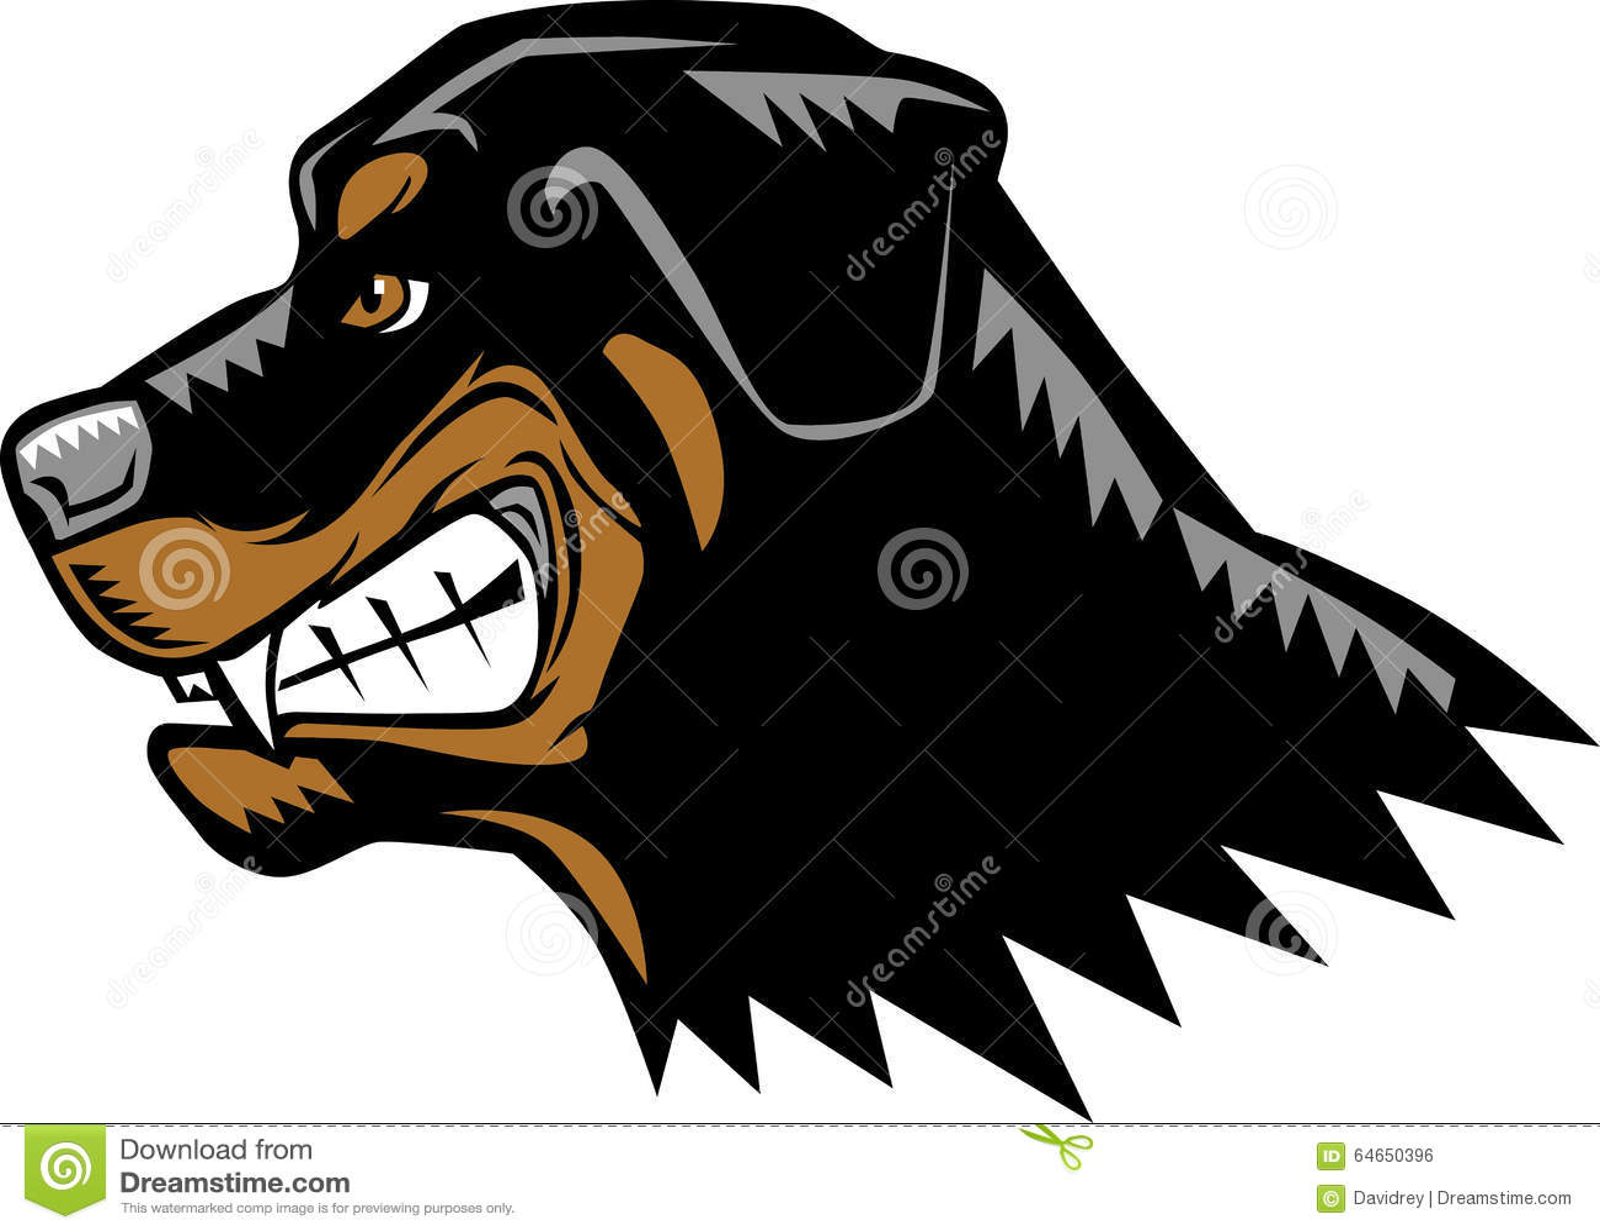 rottweiler dog mean. royalty-free vector rottweiler dog mean